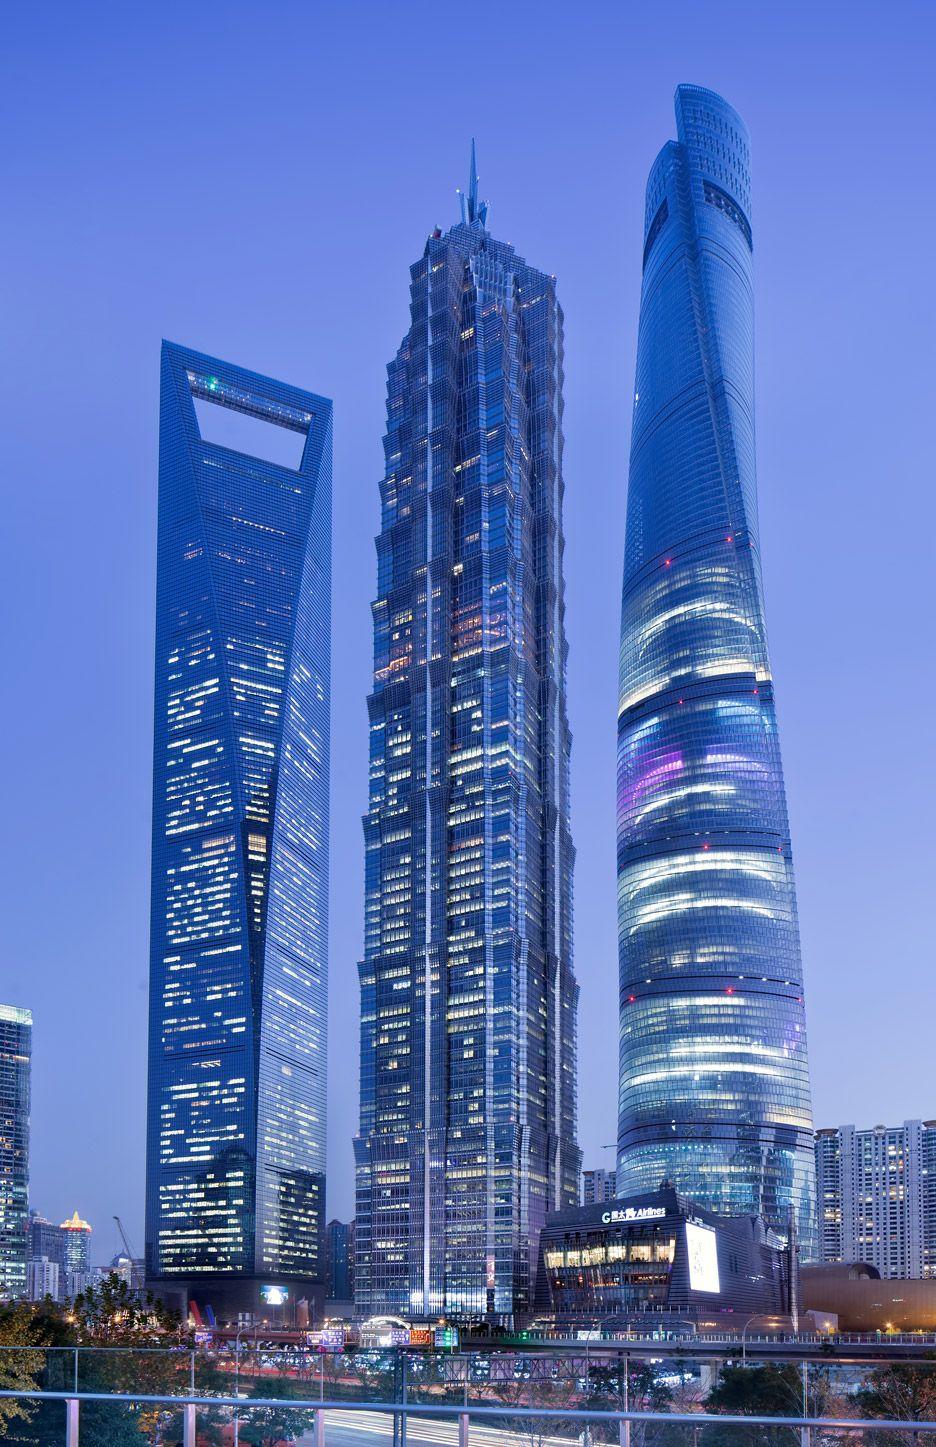 Shanghai Tower Gensler Art&arch Gratte Ciel Architecture Futuriste And